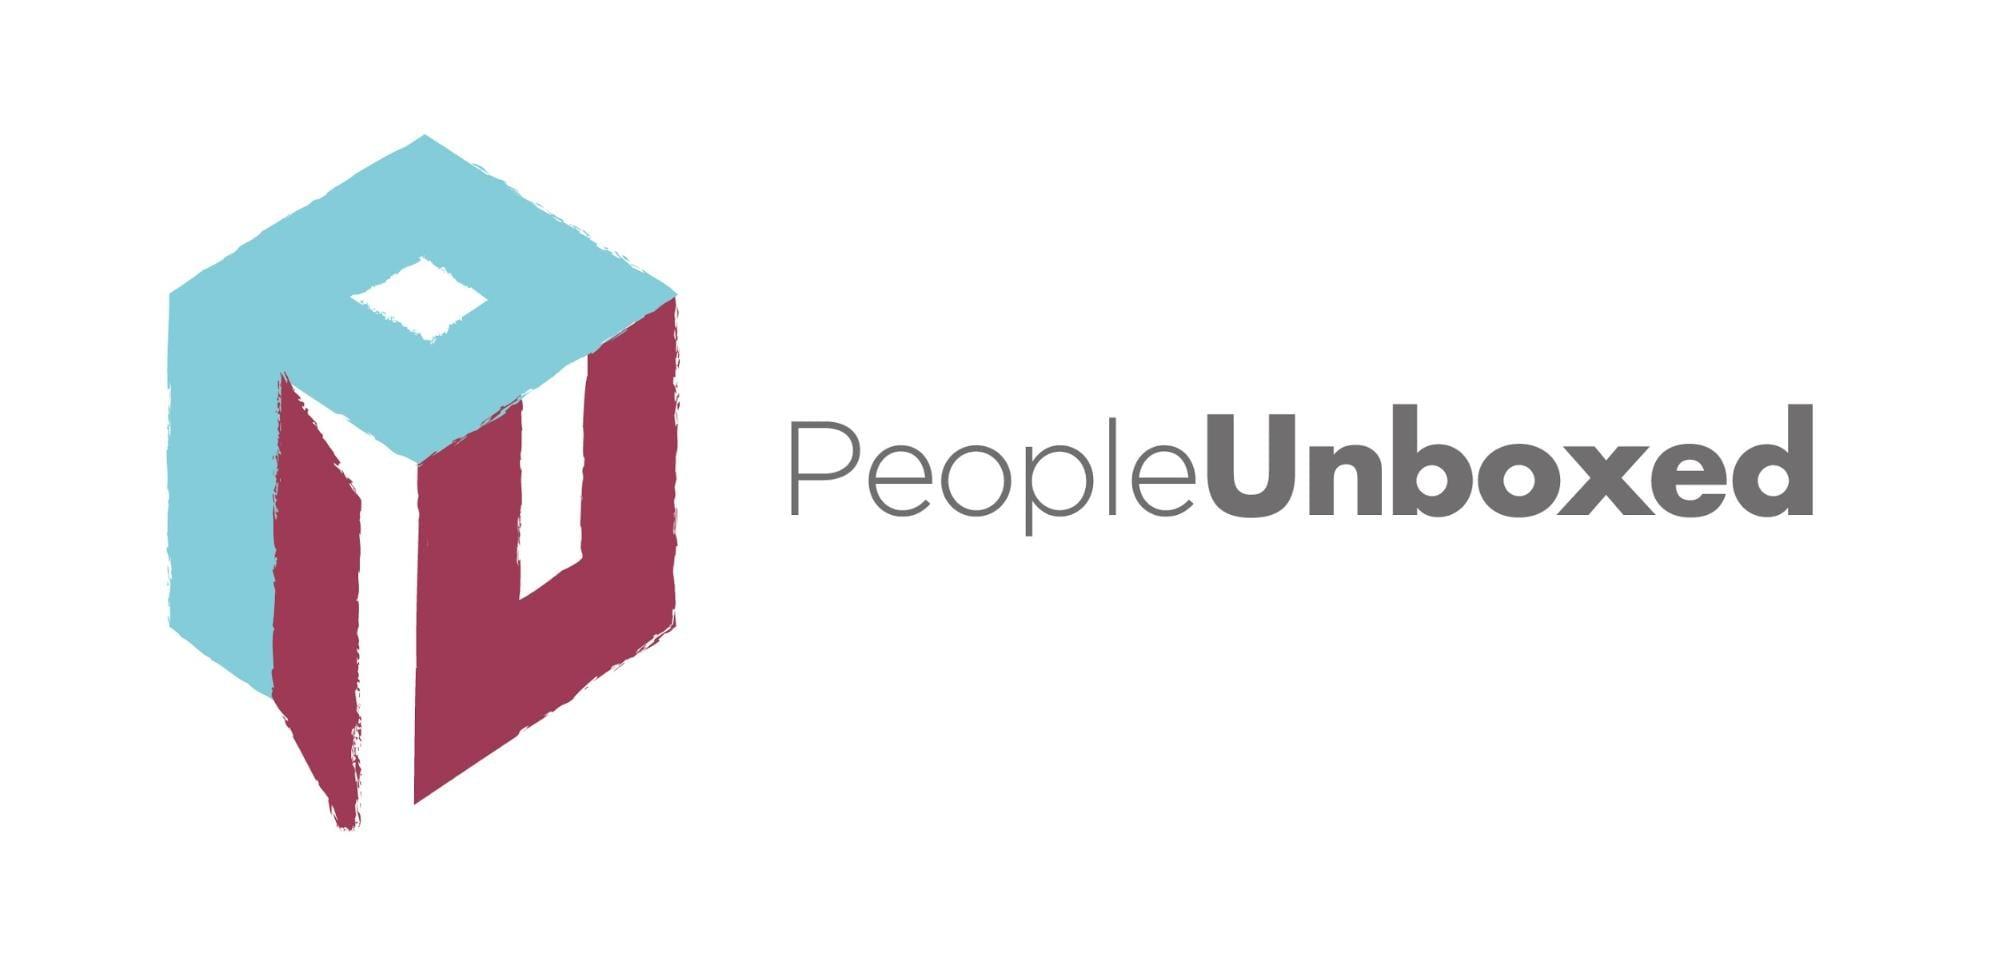 PeopleUnboxed logo